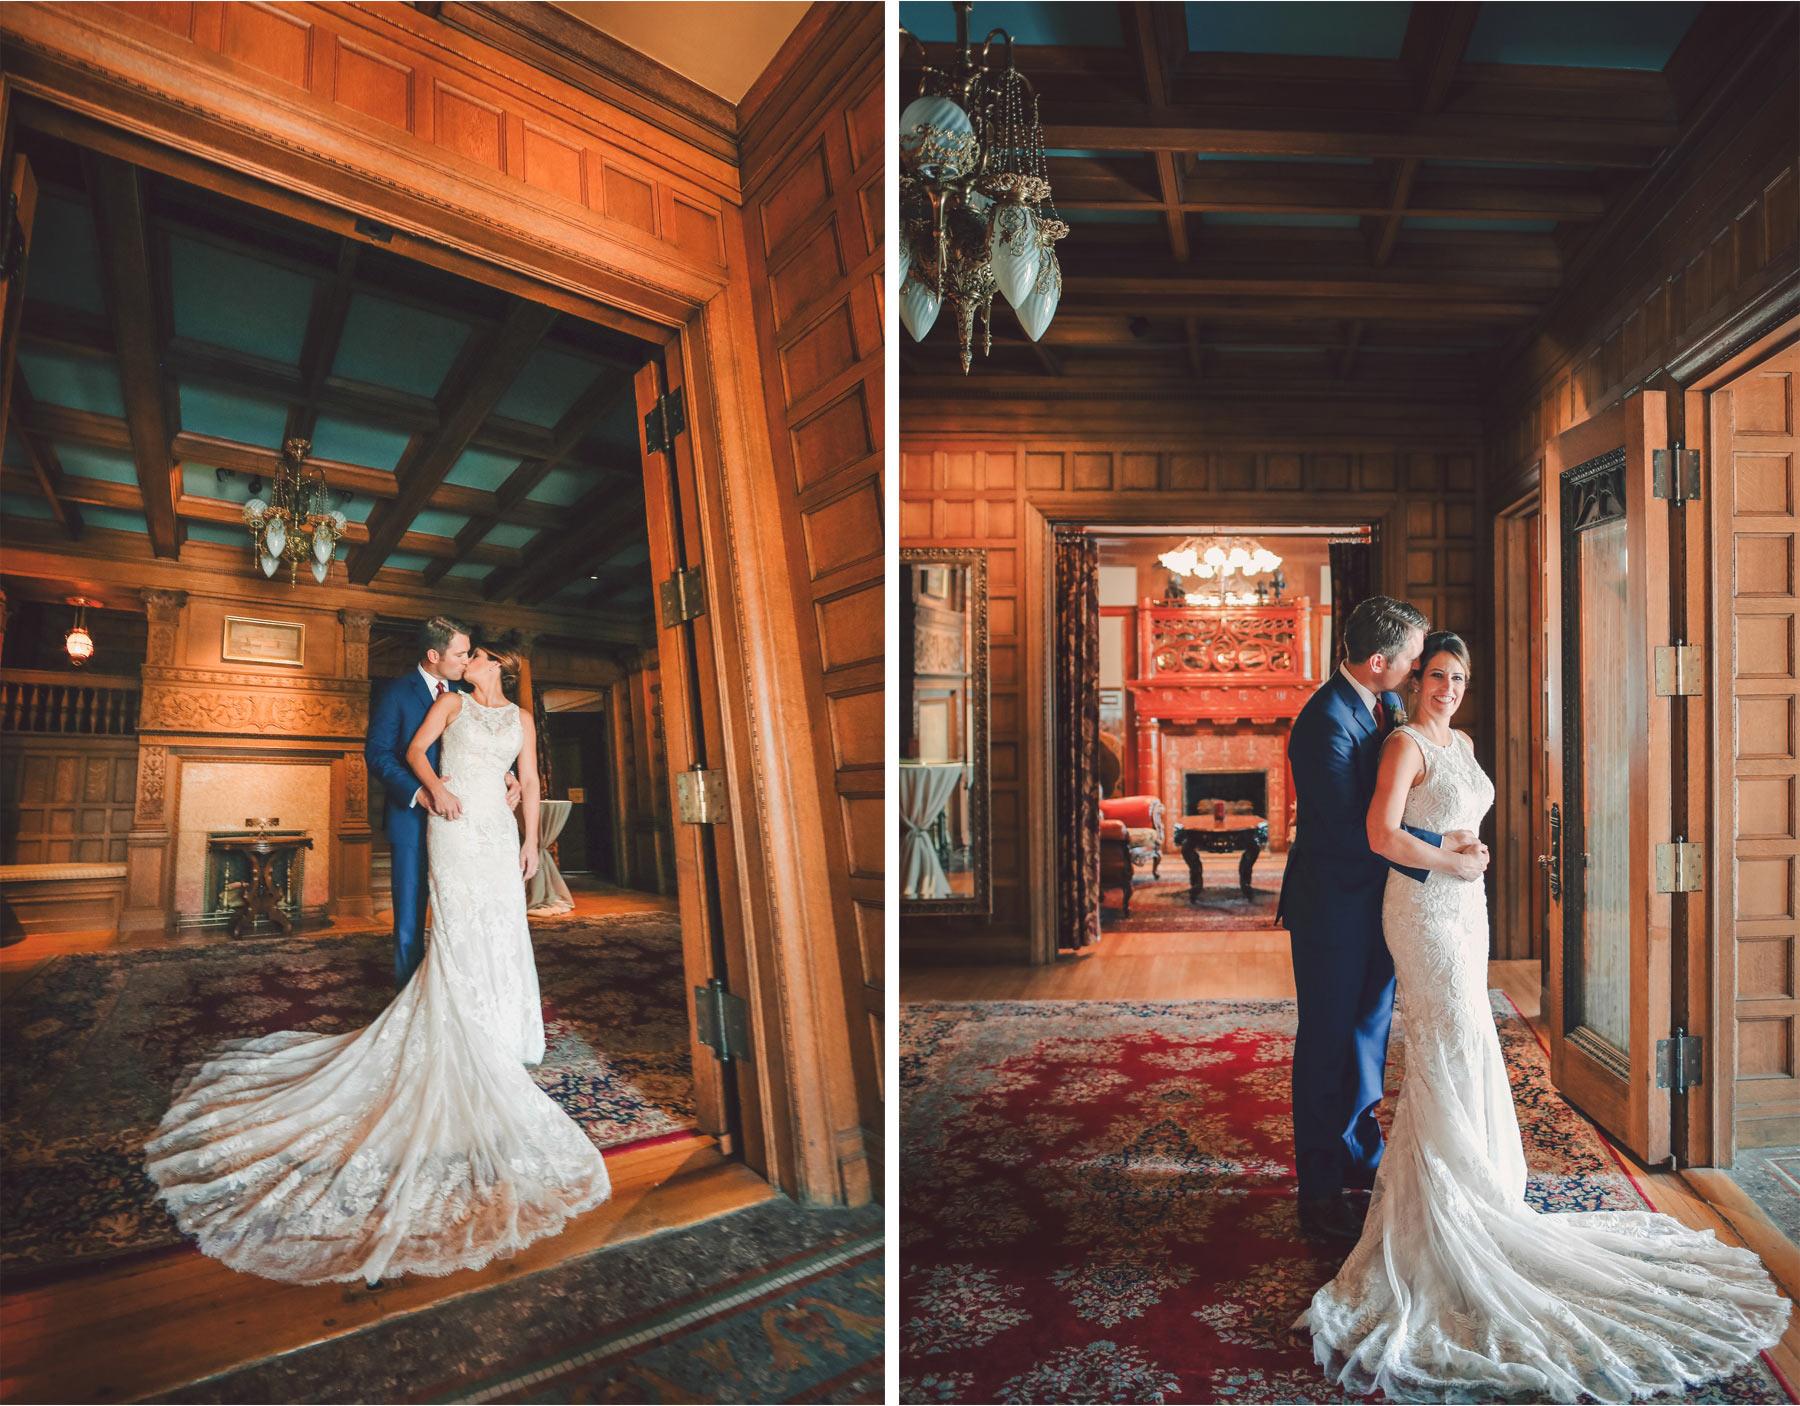 07-Minneapolis-Minnesota-Wedding-Photographer-by-Vick-Photography-Van-Dusen-Mansion-Megan-and-Ned.jpg